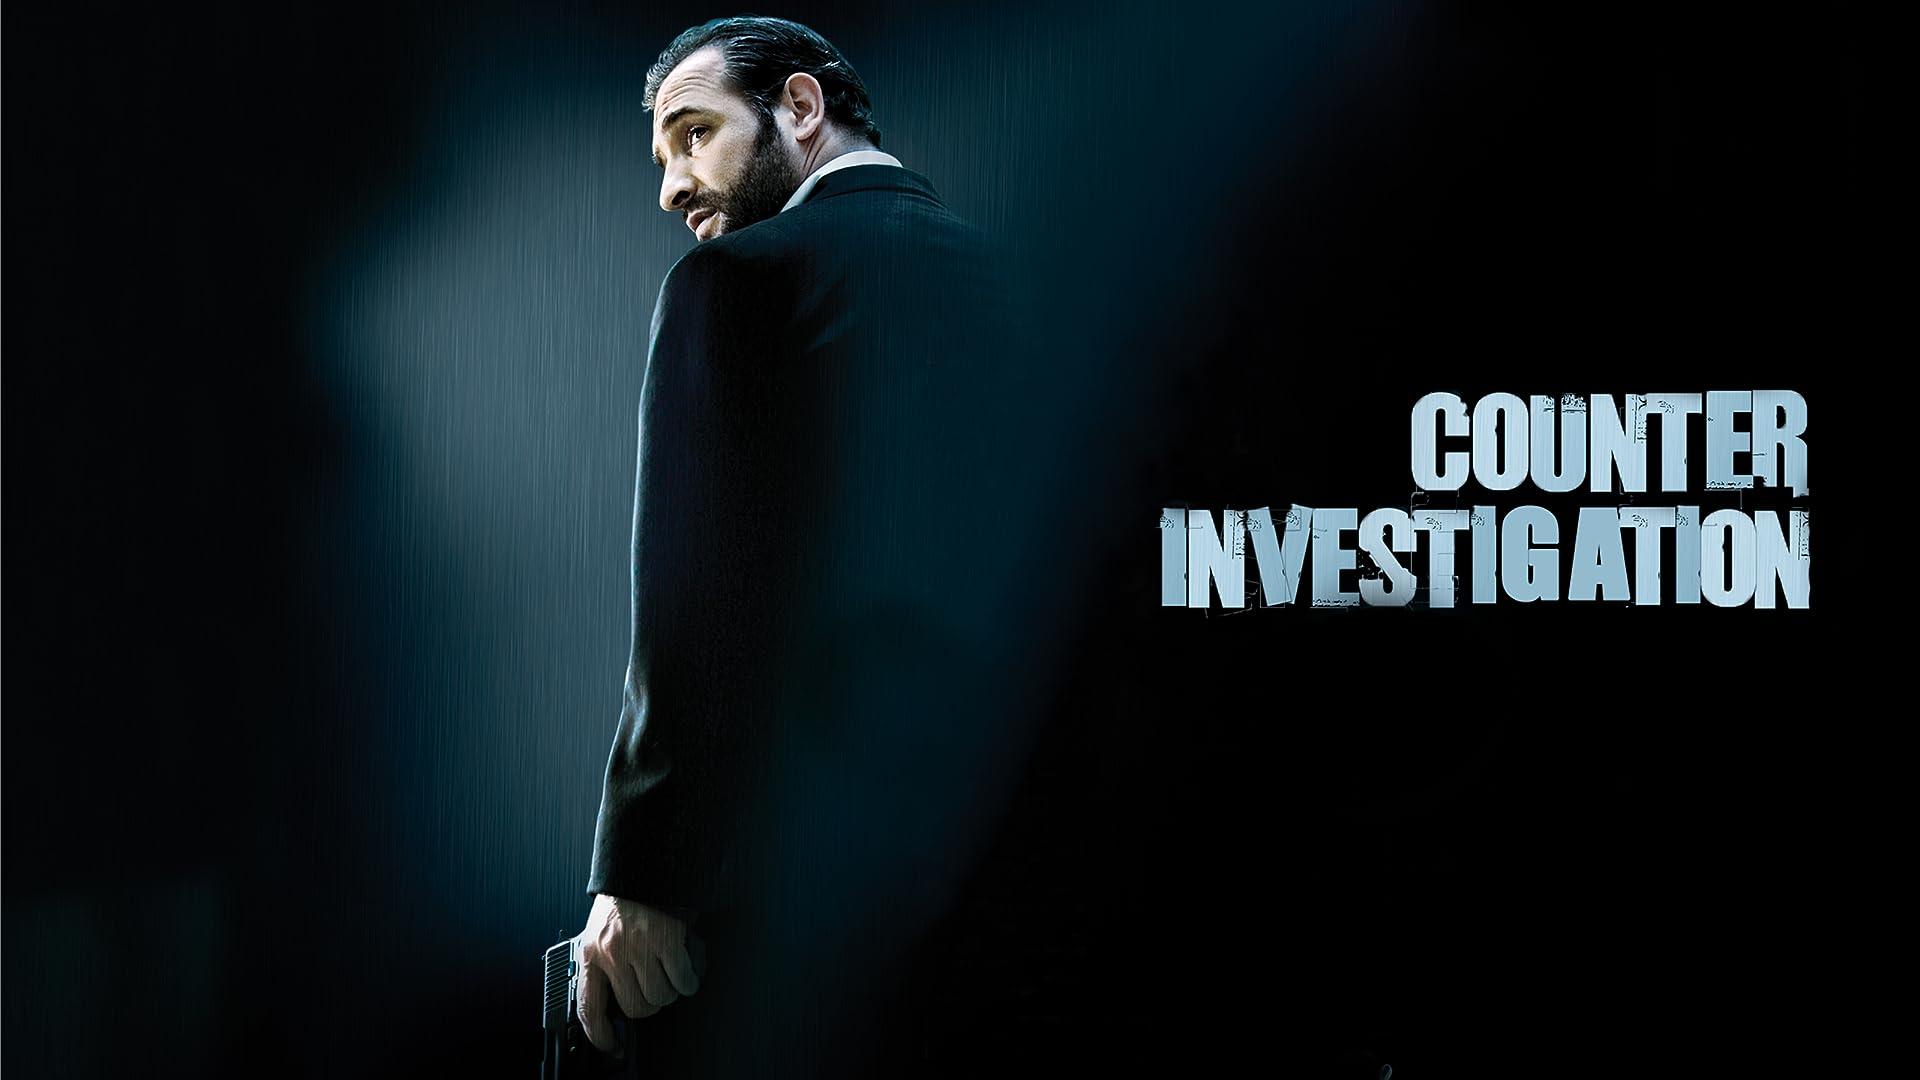 Counter Investigation